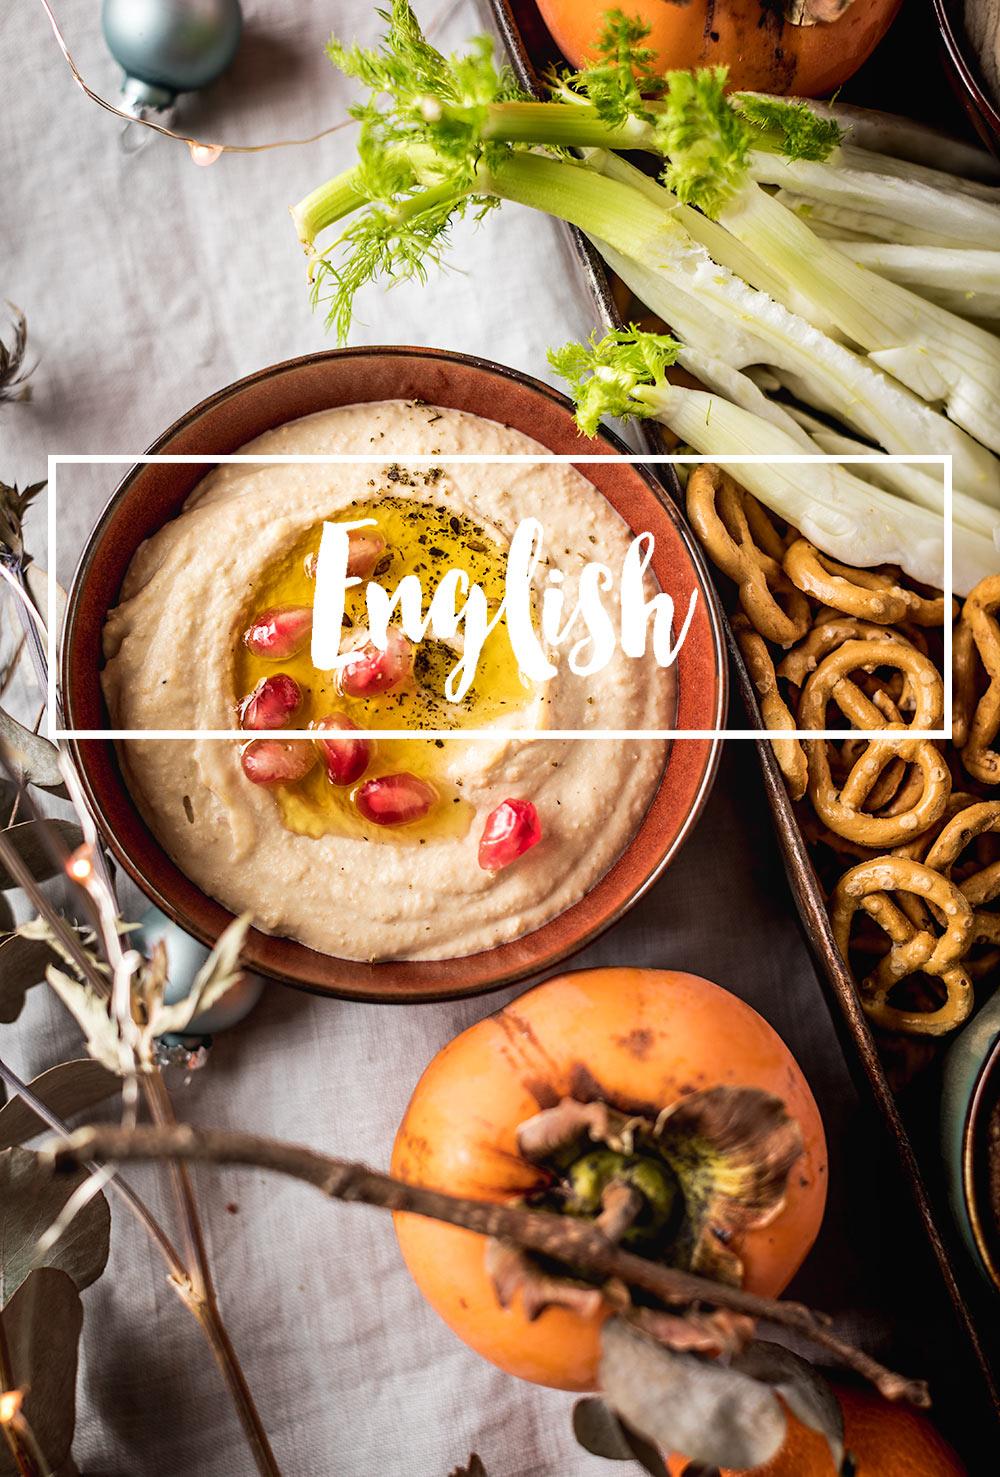 Beauty Food Blog healthy vegan plant-based recipes gluten-free